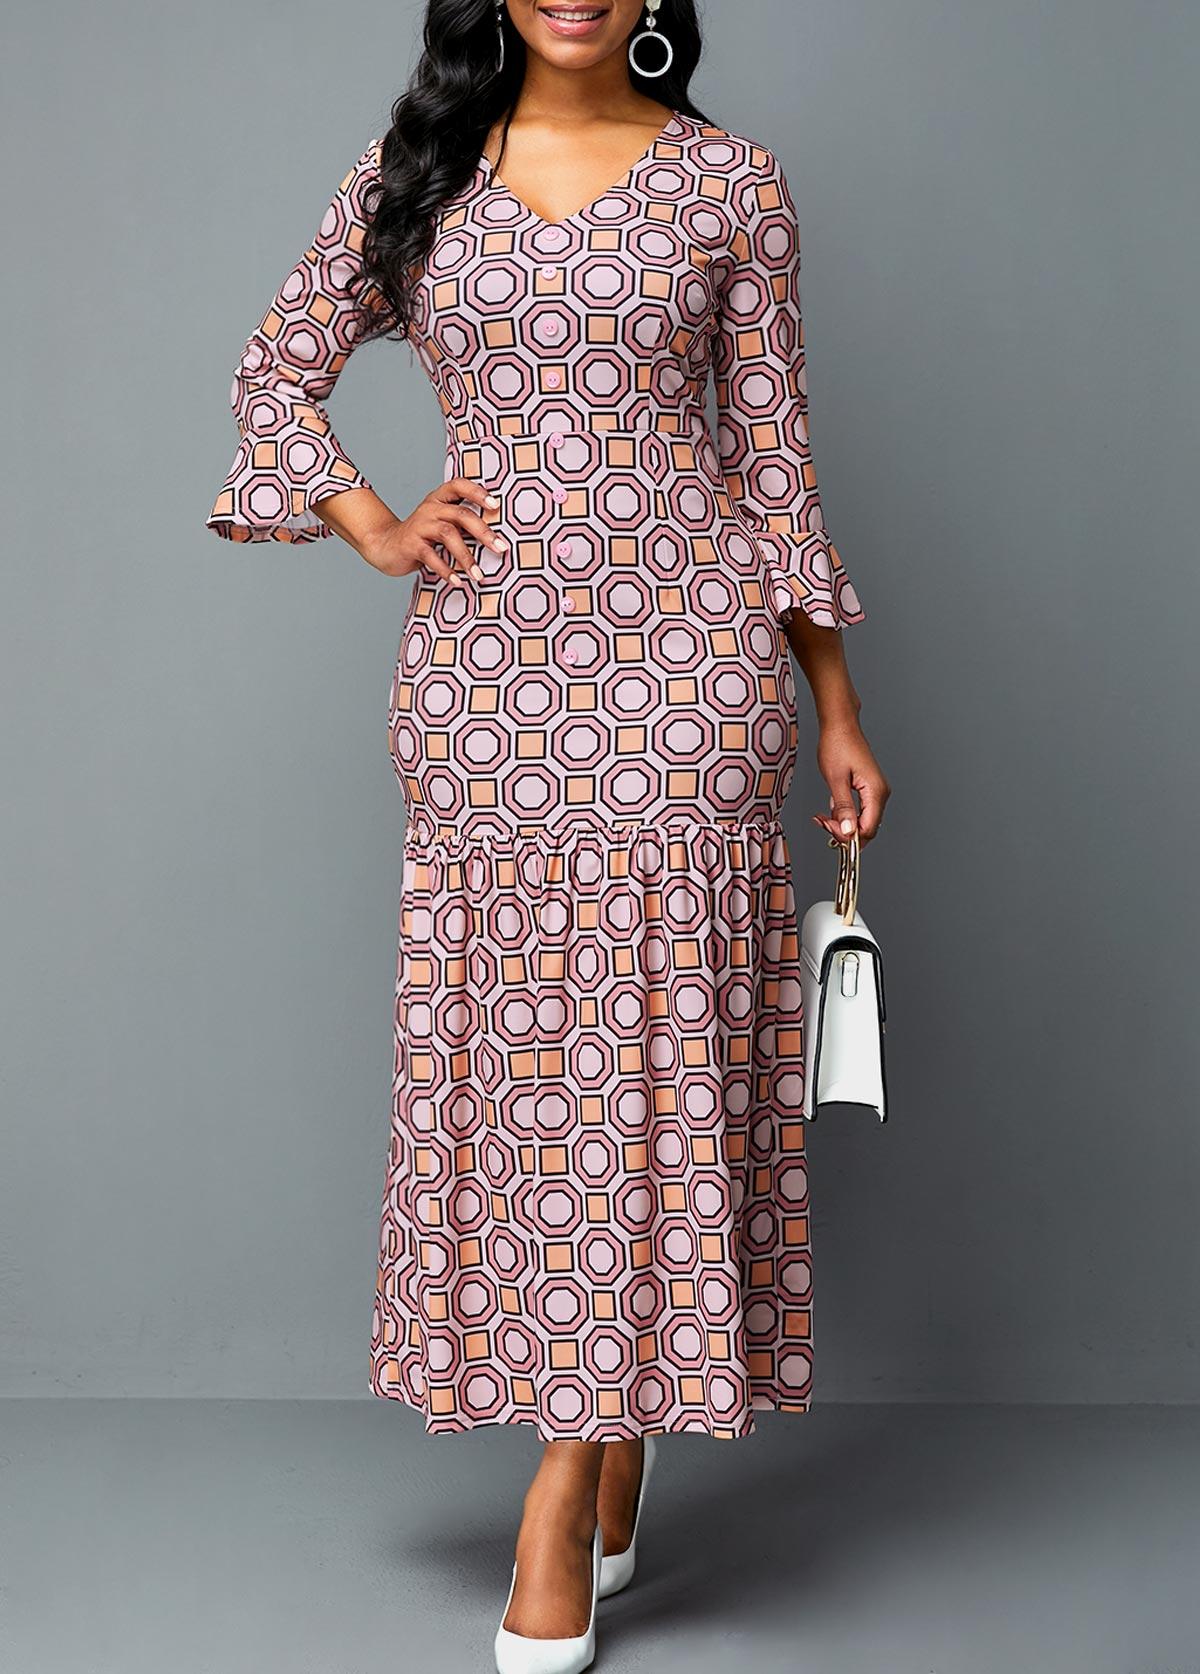 Geometric Print Flare Sleeve Plunging Neck Dress